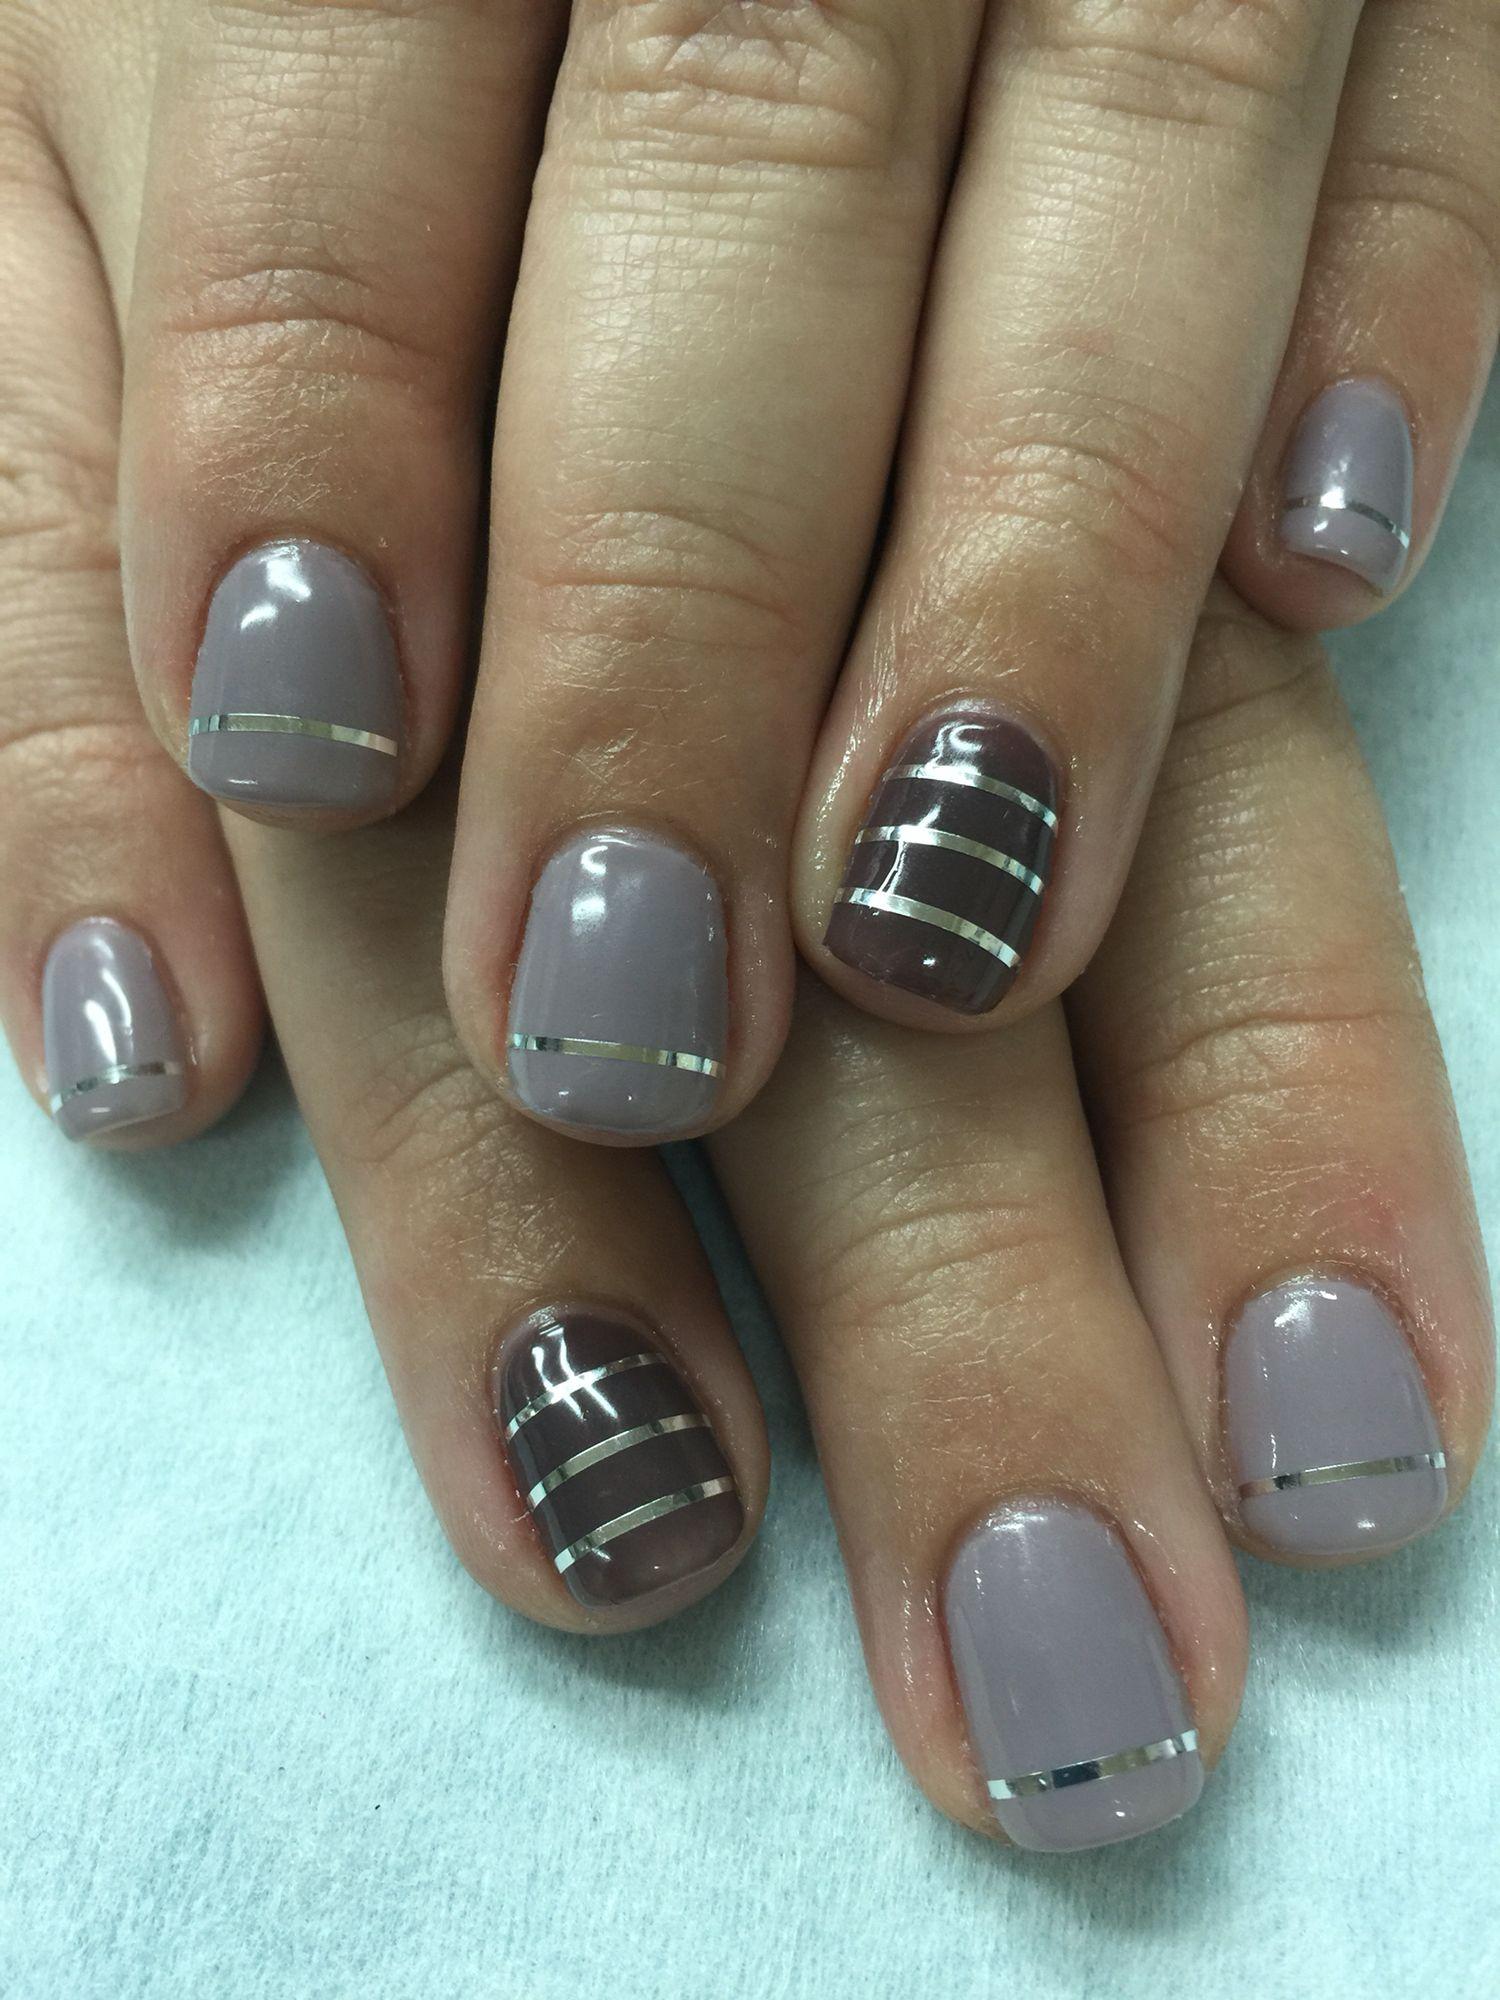 Grey Lavender and dark Plum gel polish over non-toxic odorless hard ...